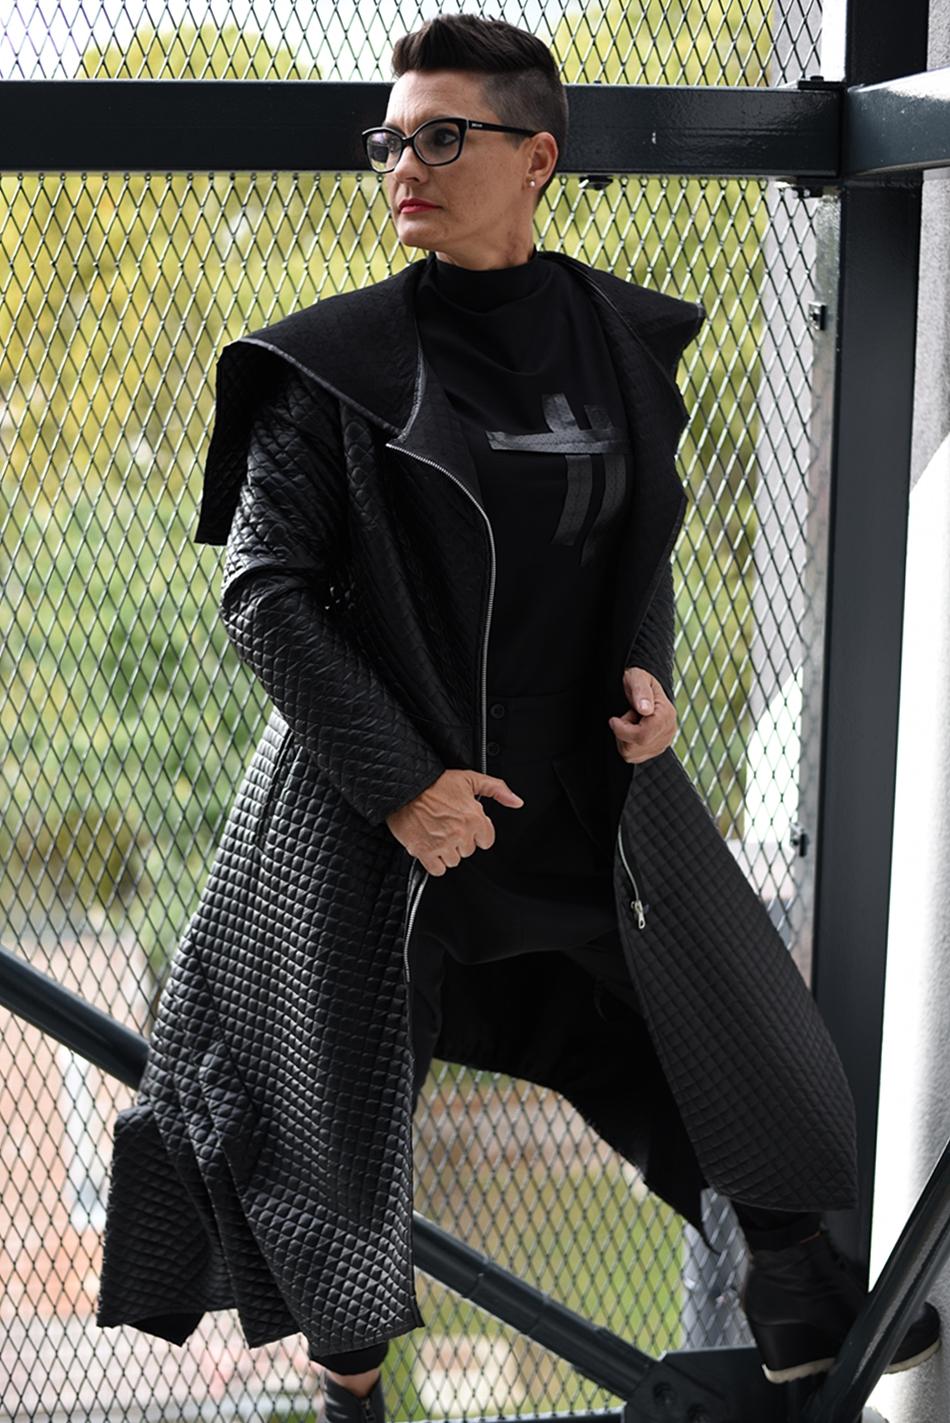 Broth_design_clothes_066